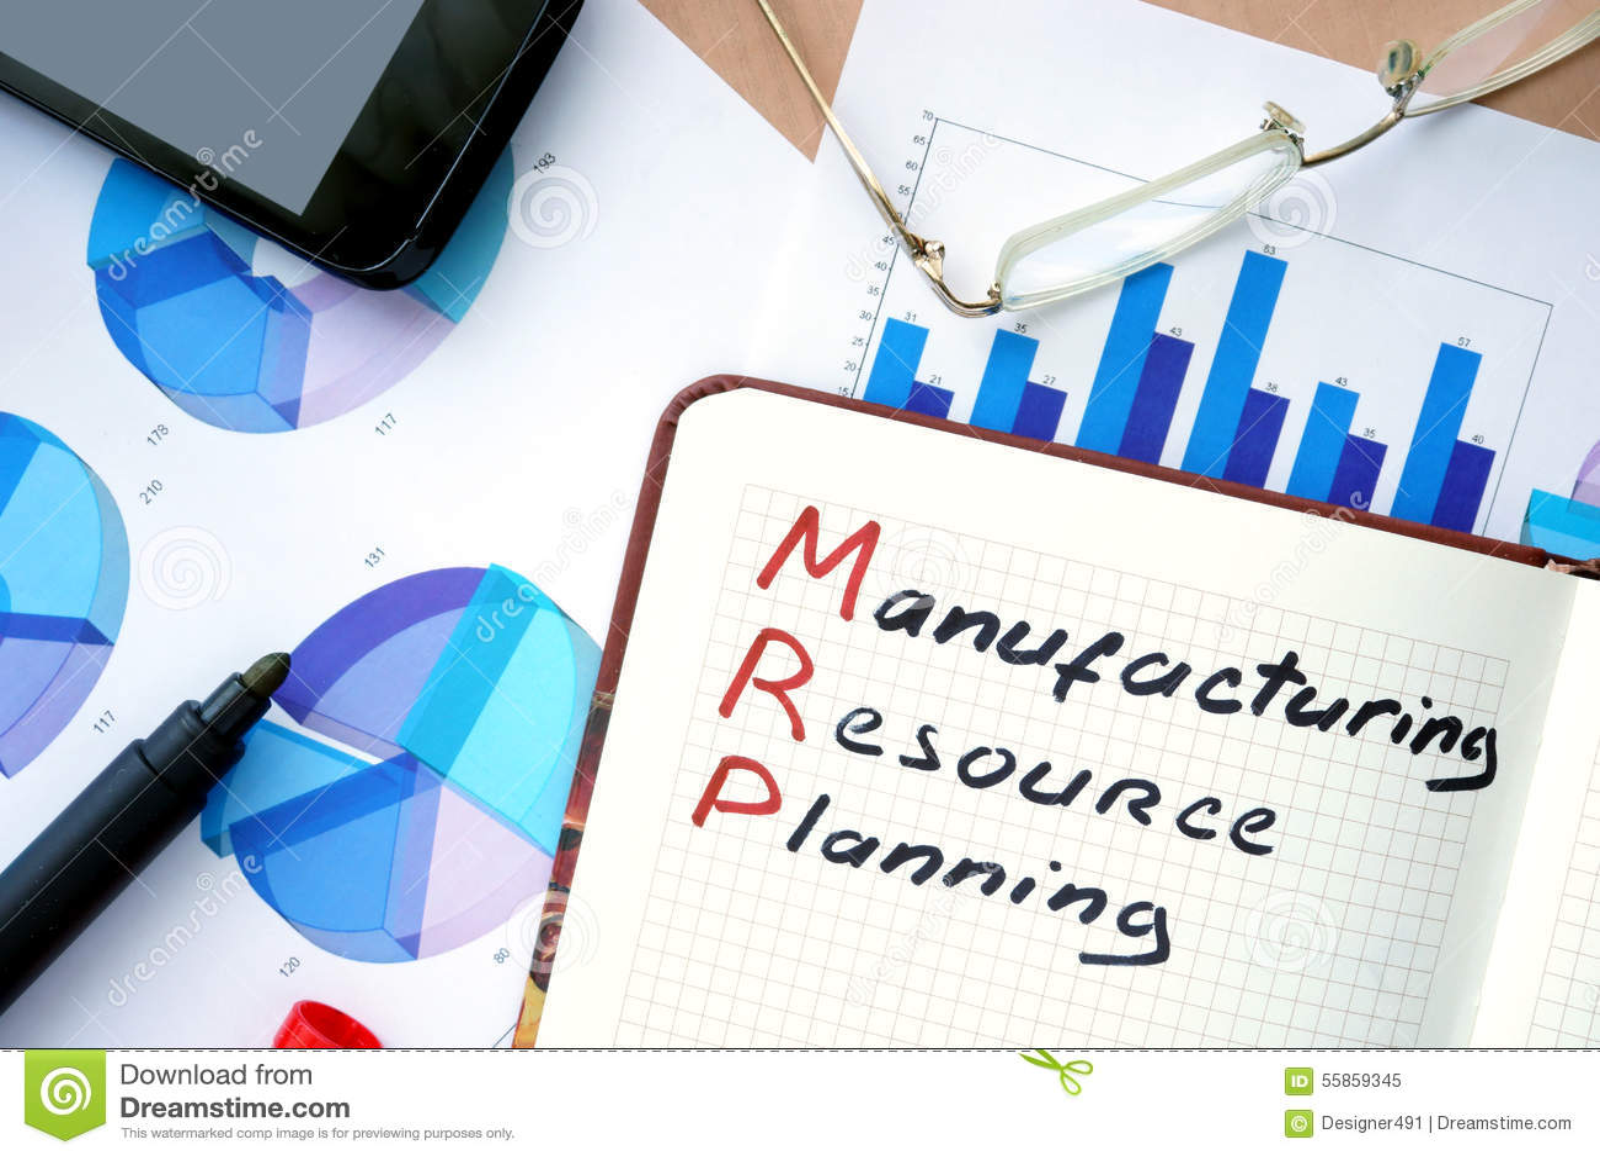 MRP Manufacturing Resource Planning Stock Photo - Image: 55859345